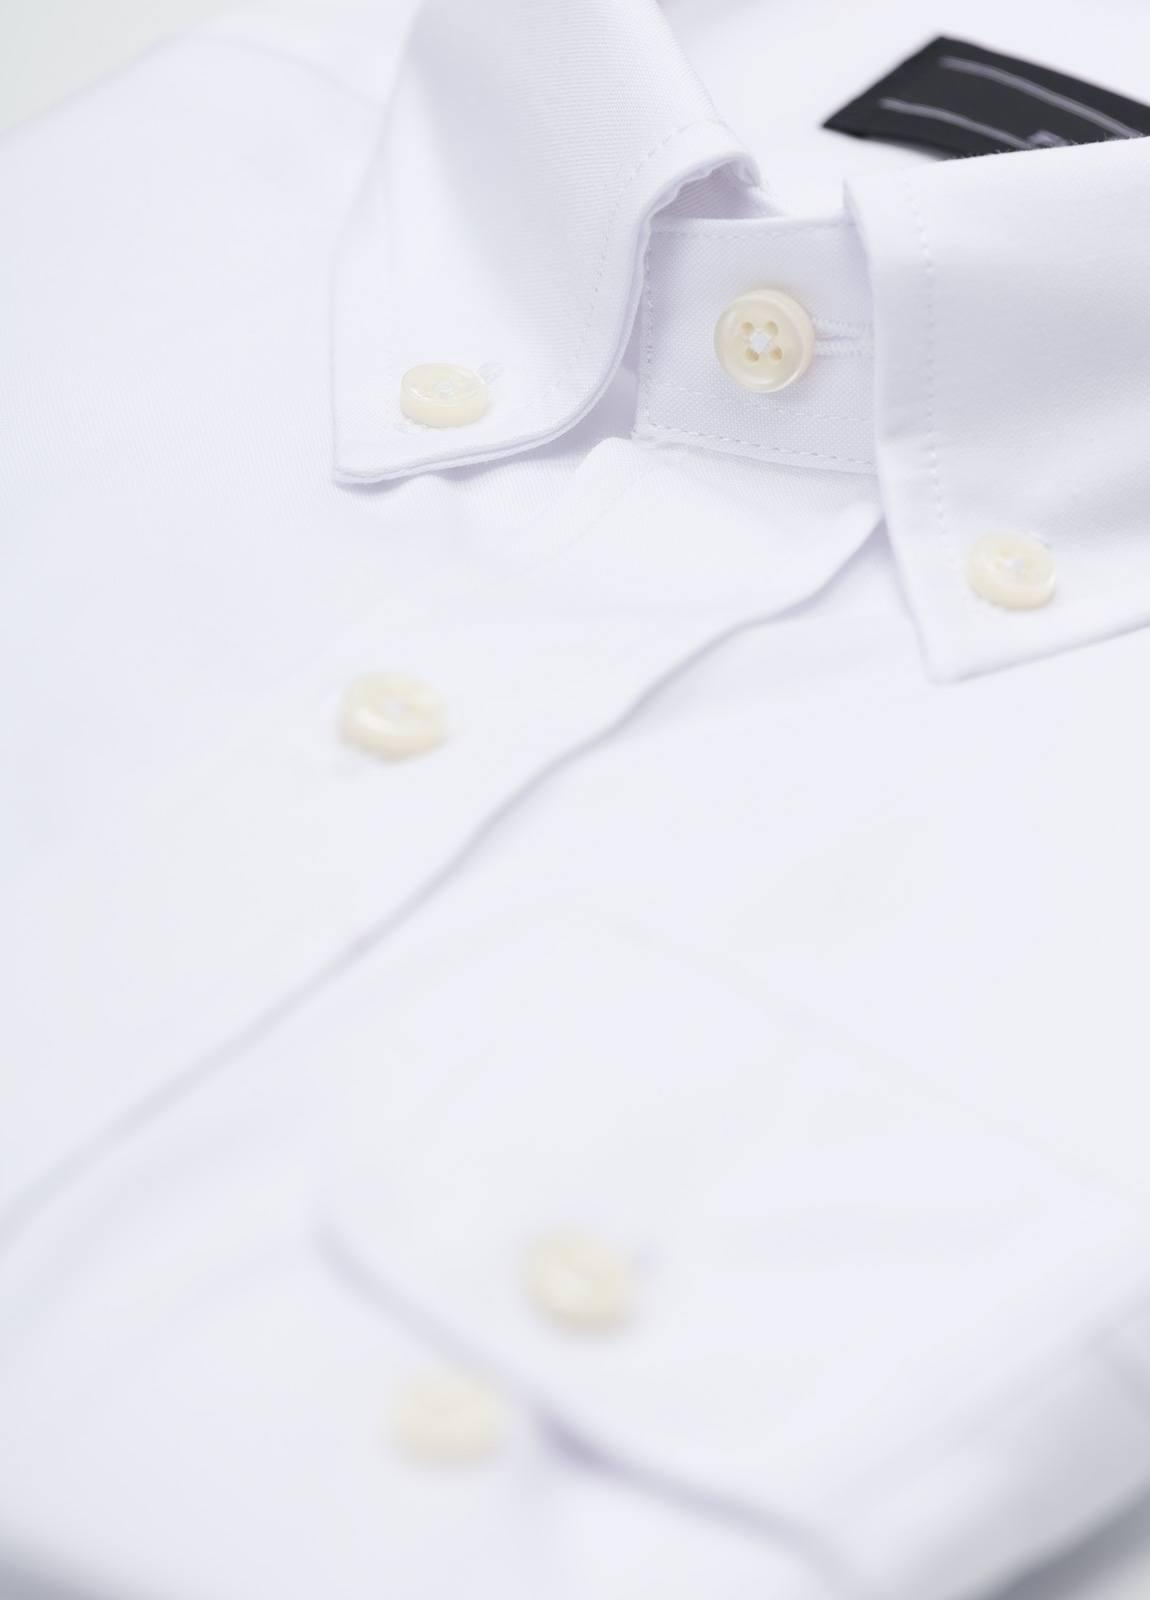 Camisa Formal Wear REGULAR FIT modelo BOTTON DOWN, con bolsillo, lisa, color blanca . 100% Algodón. Fácil planchado. - Ítem1